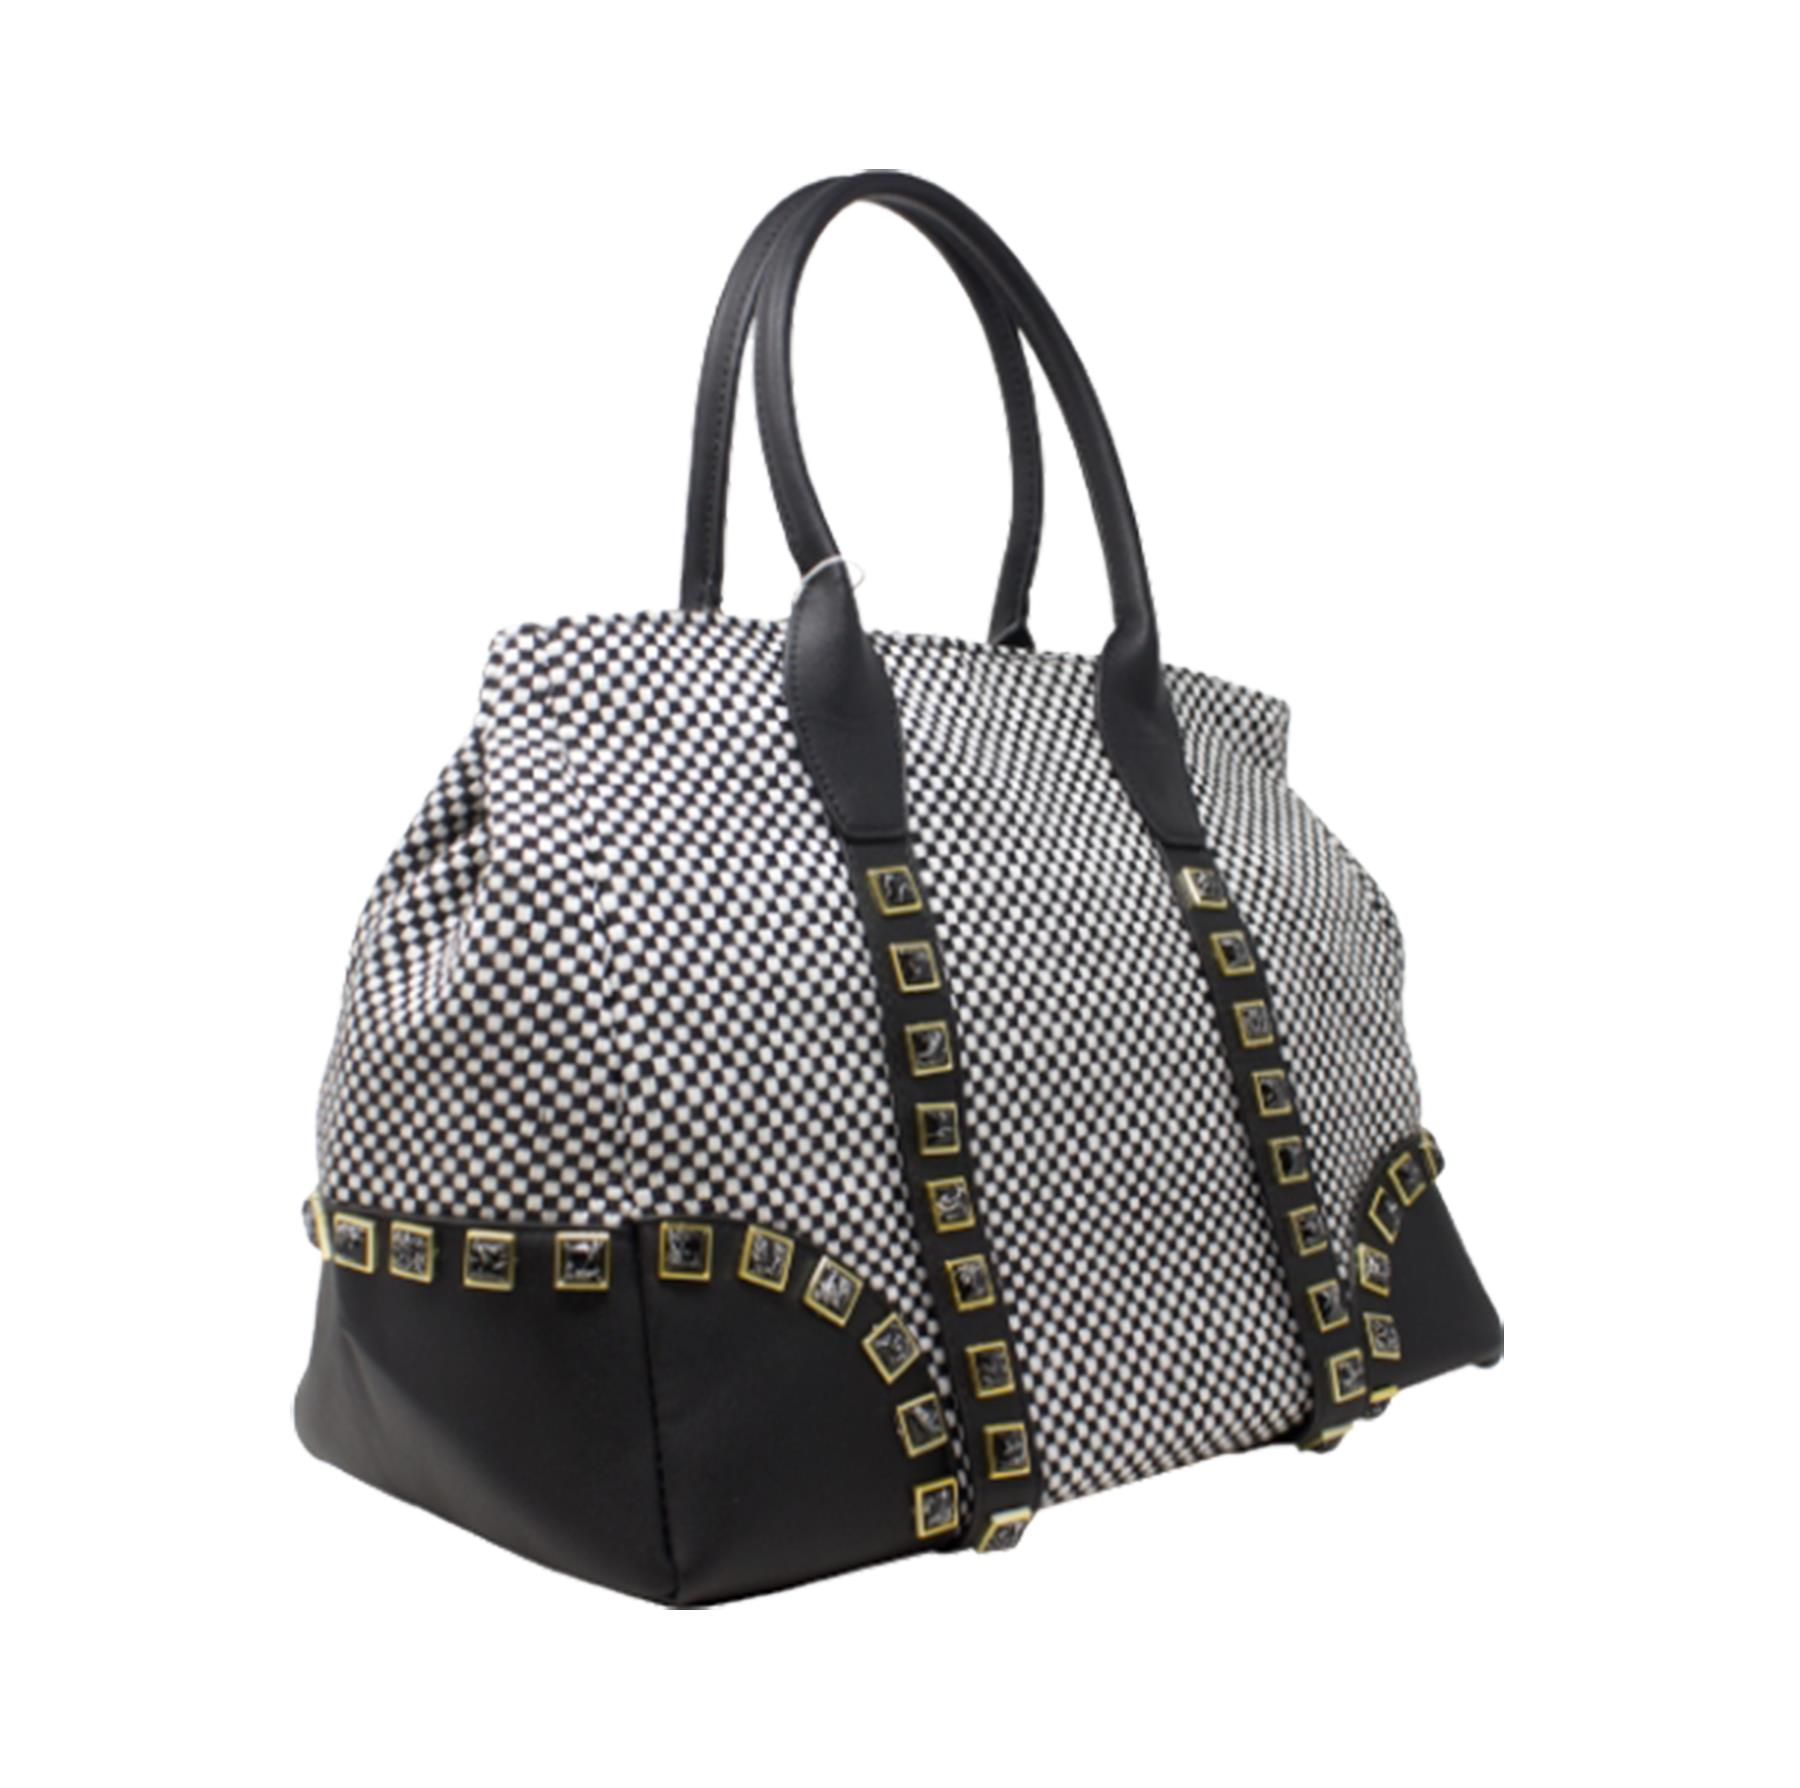 New-Women-s-Small-Check-Pattern-Studded-Design-Tote-Bag-Handbag thumbnail 5